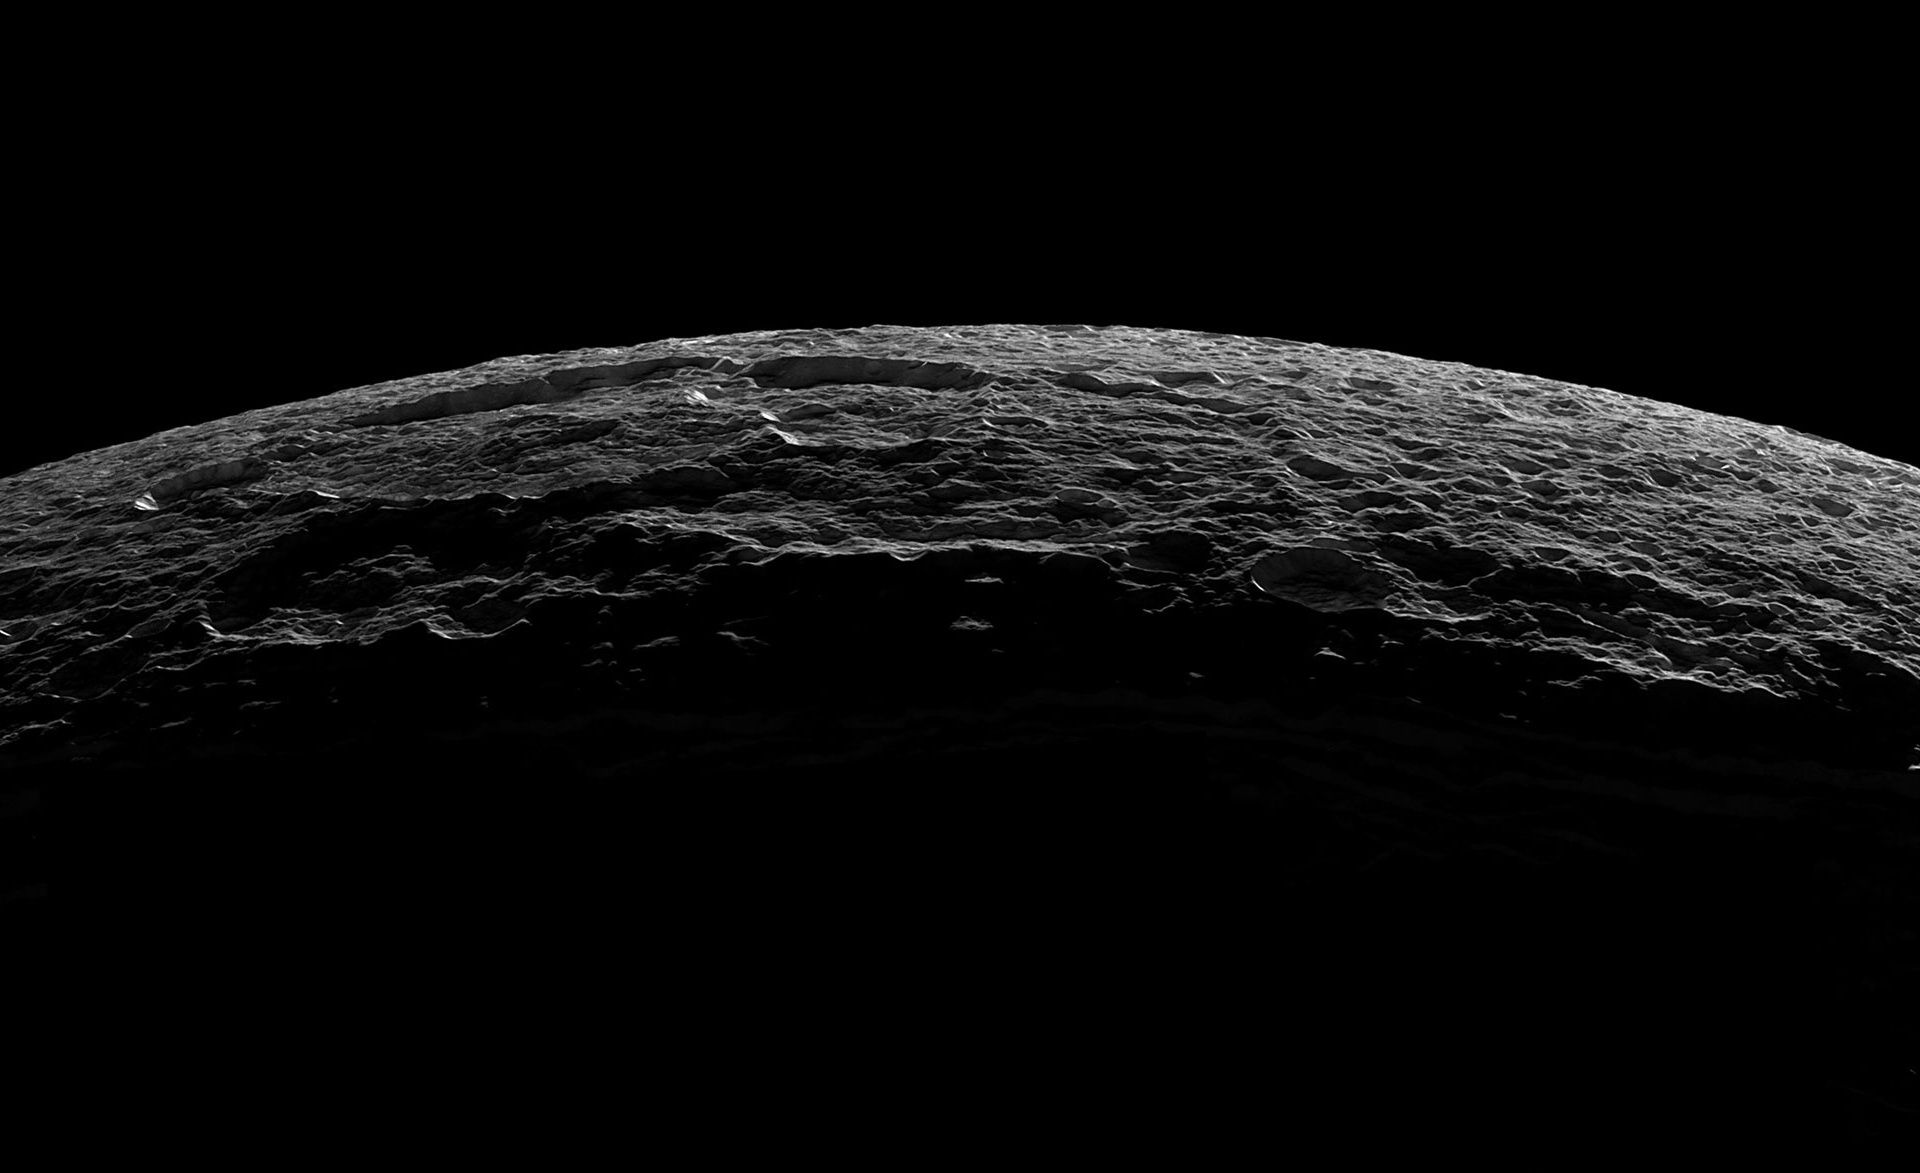 Dark Desktop Wallpaper Hd Bing In 2020 Saturns Moons Dark Wallpaper Nasa Universe